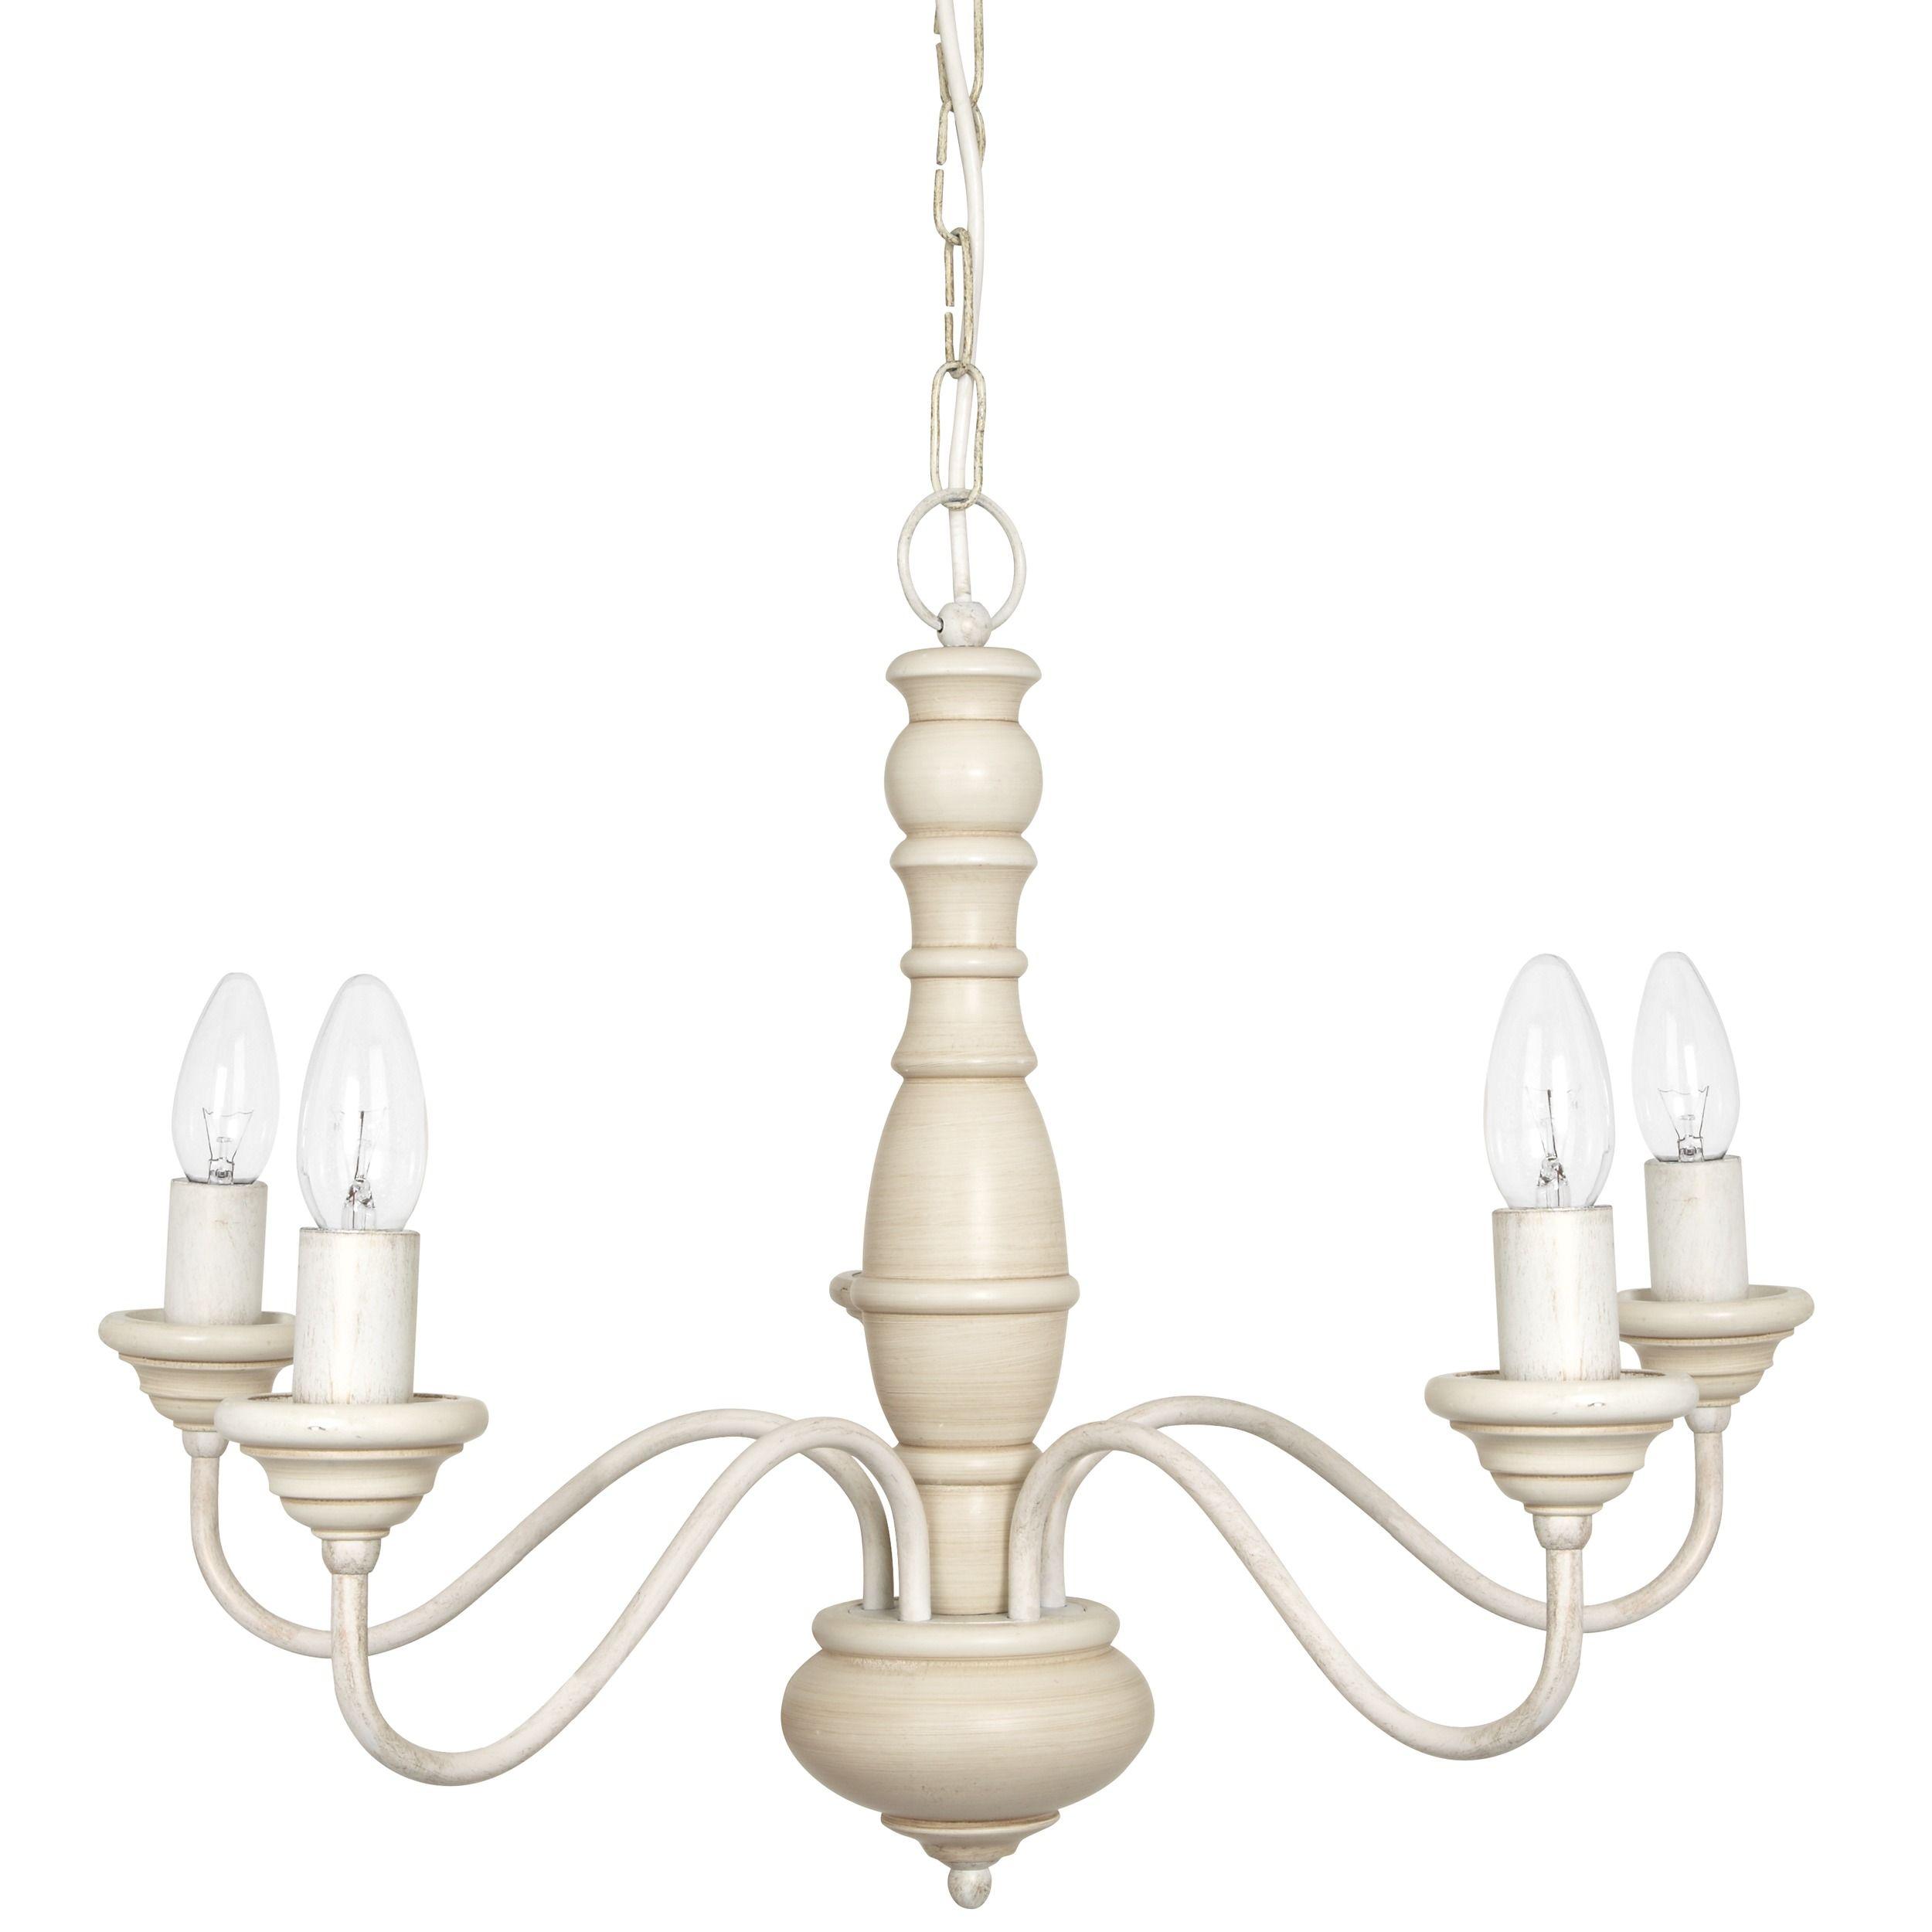 Cream chandelier milnsbridge cream 5 light chandelier at laura cream chandelier milnsbridge cream 5 light chandelier at laura ashley such a lovely color mozeypictures Choice Image